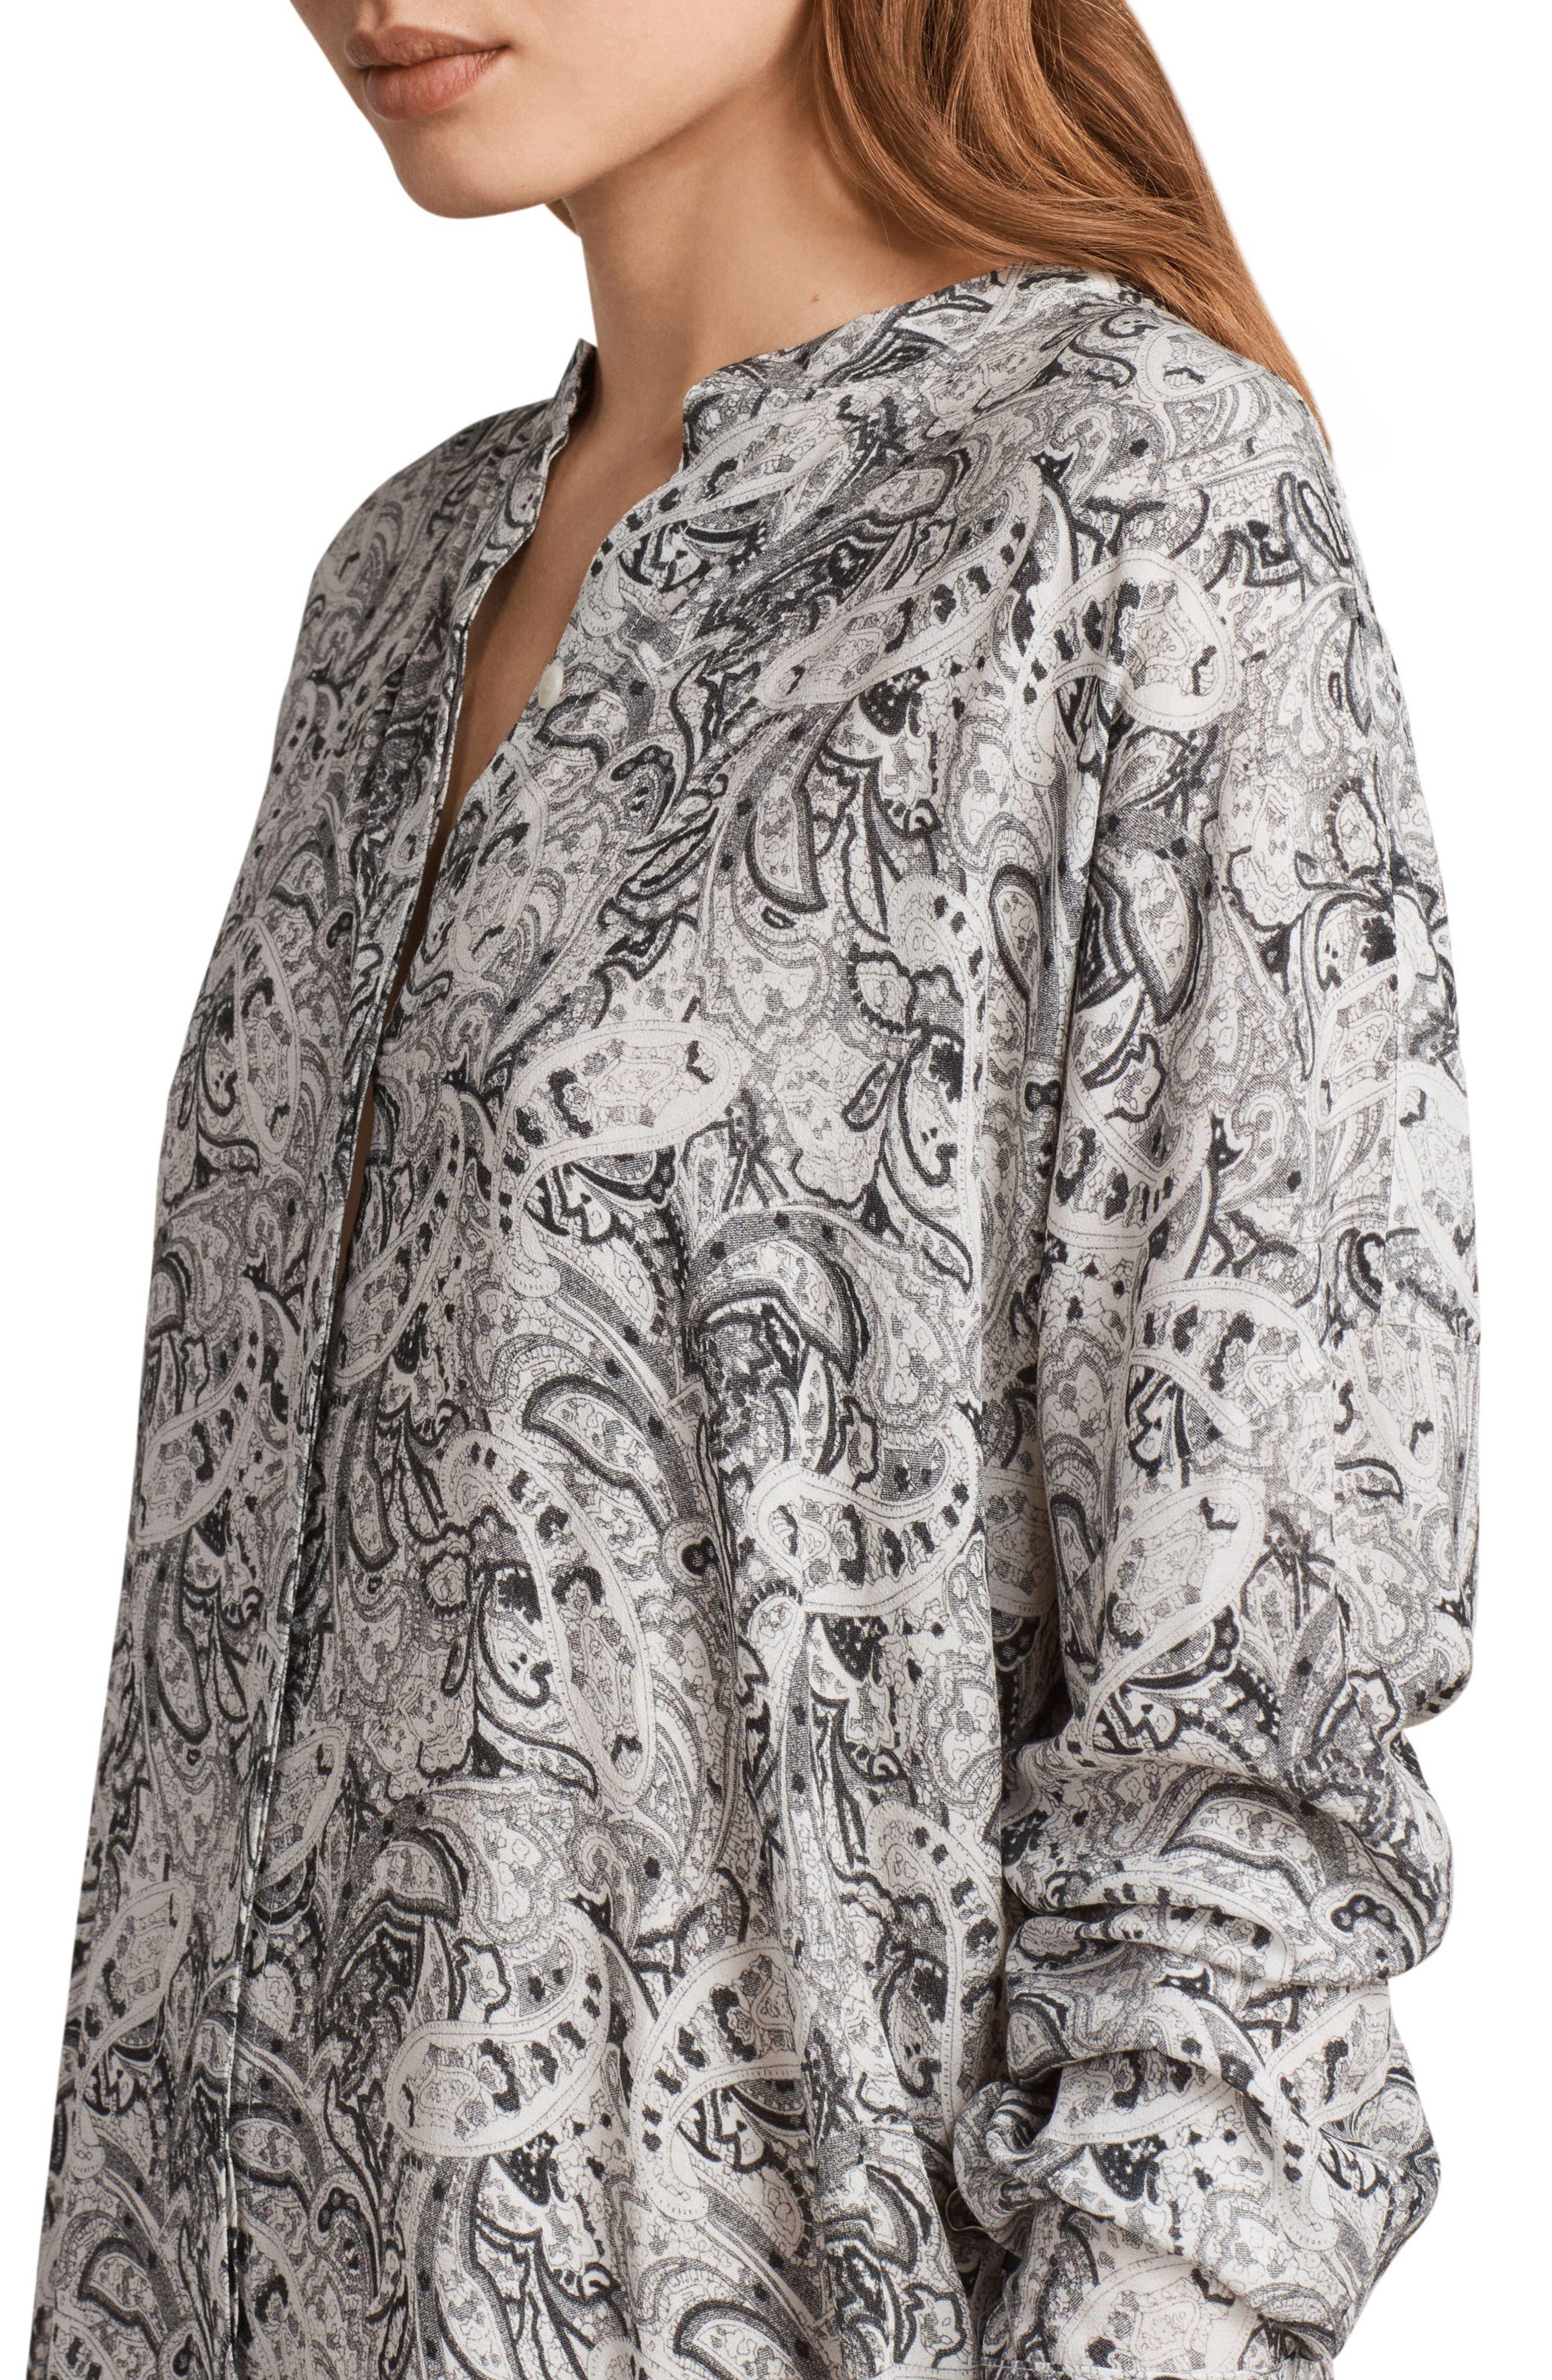 Cayla Paisley Shirtdress,                             Alternate thumbnail 5, color,                             100